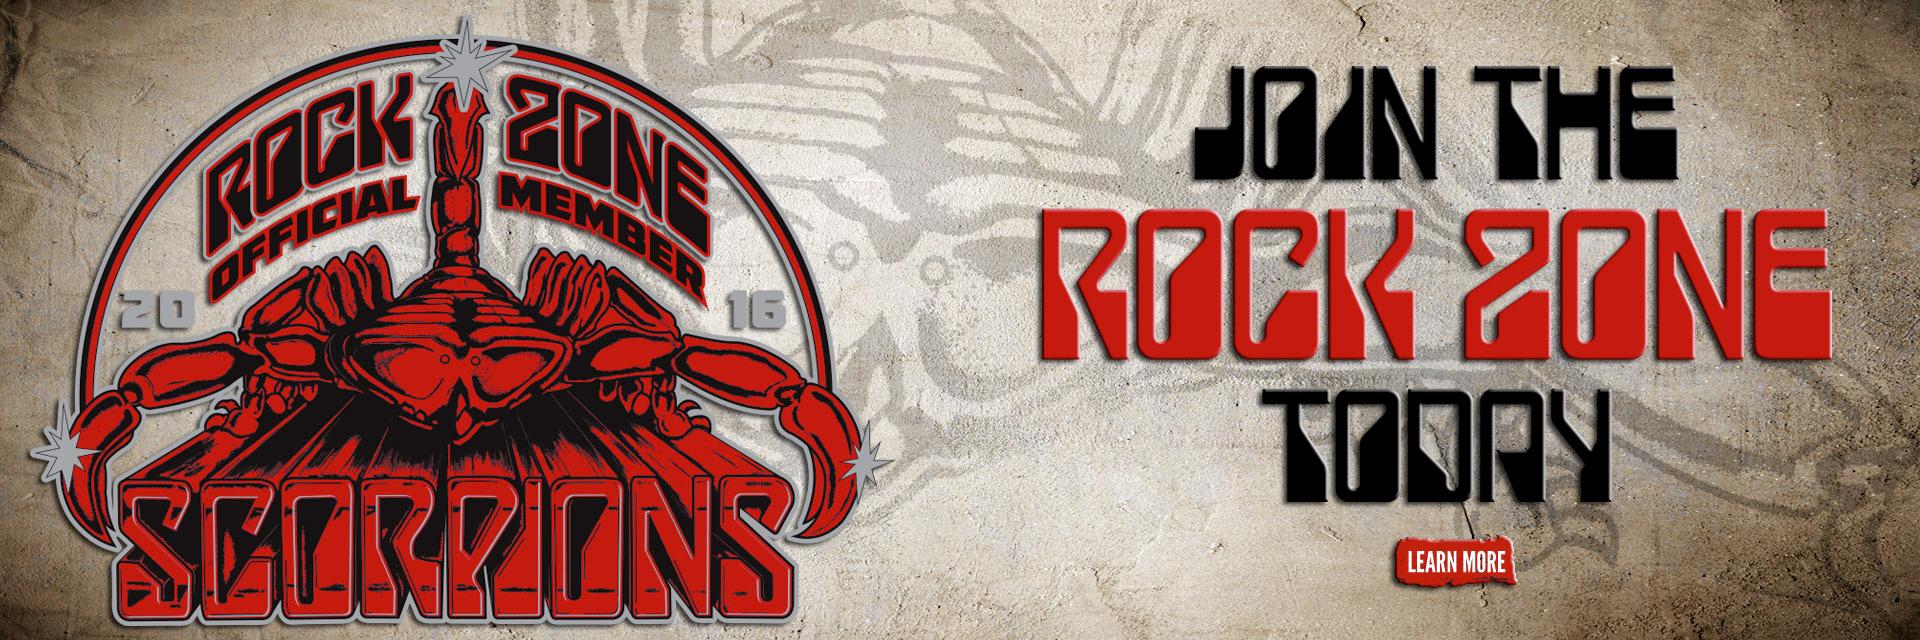 scorpions-rockzone